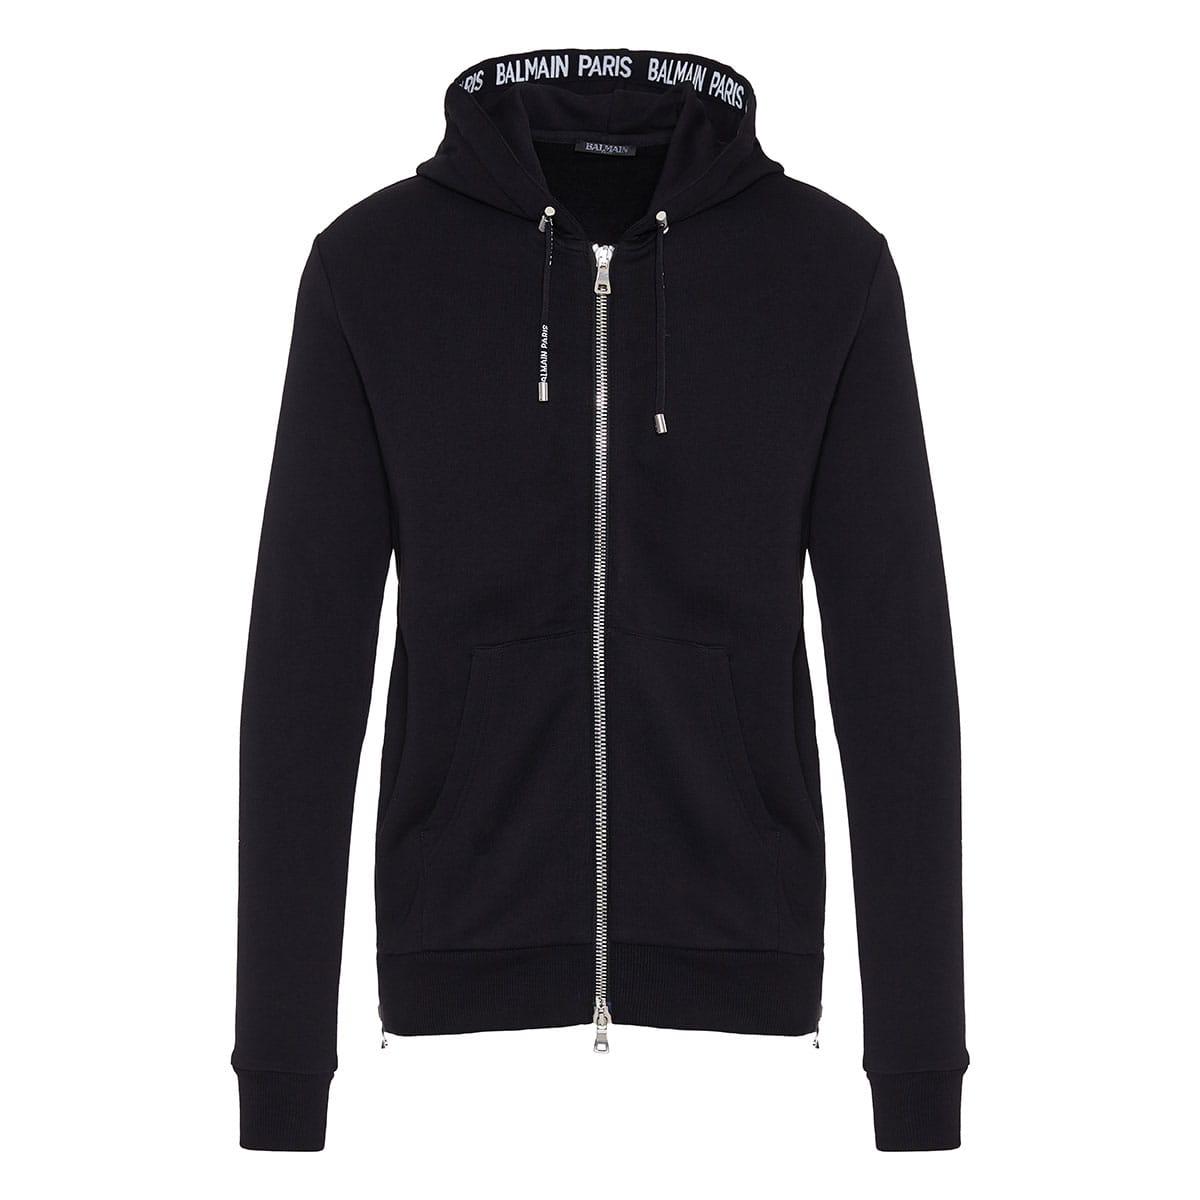 Zipper hoodie with logo details